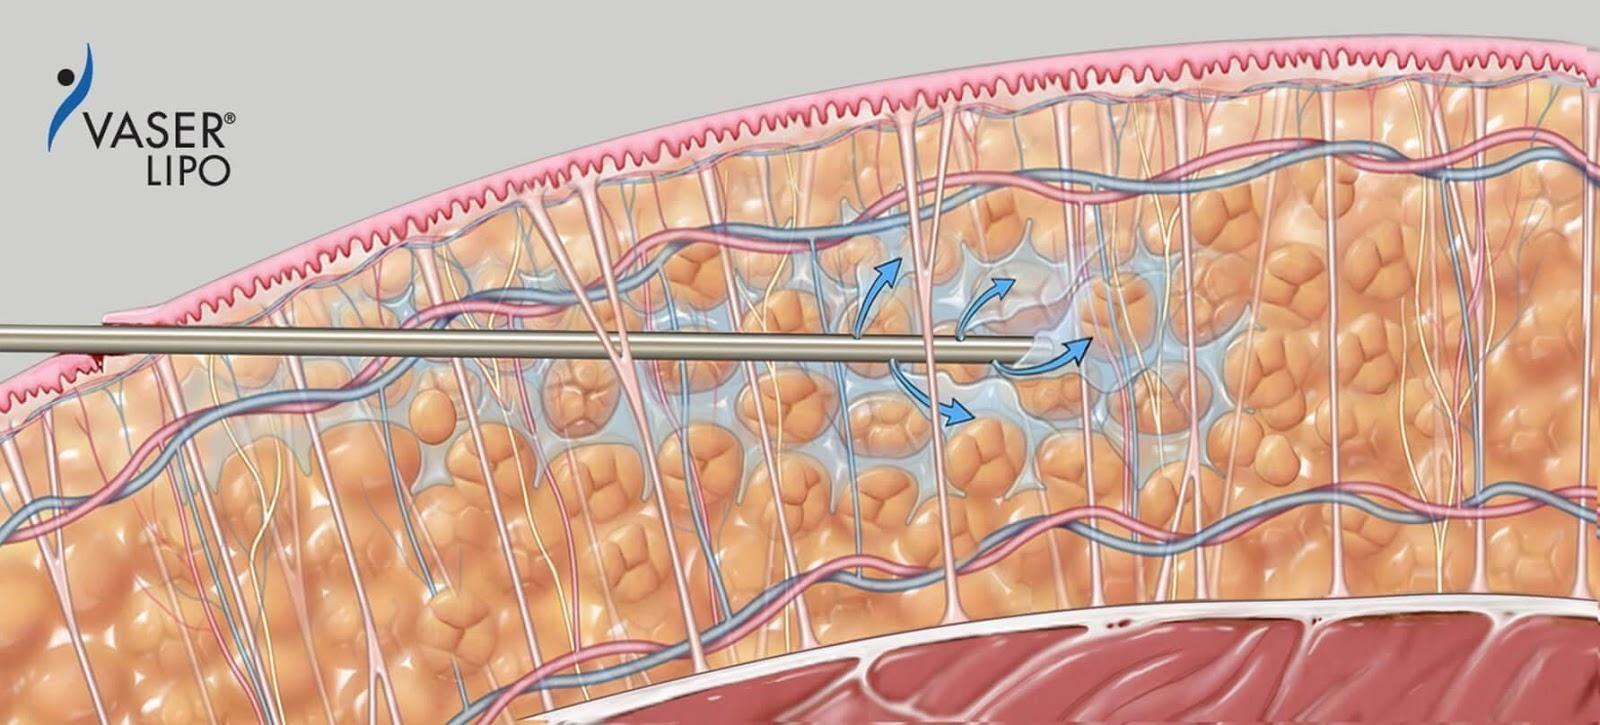 VASER Liposuction Singapore Amaris B Clinic Process Infiltration  2